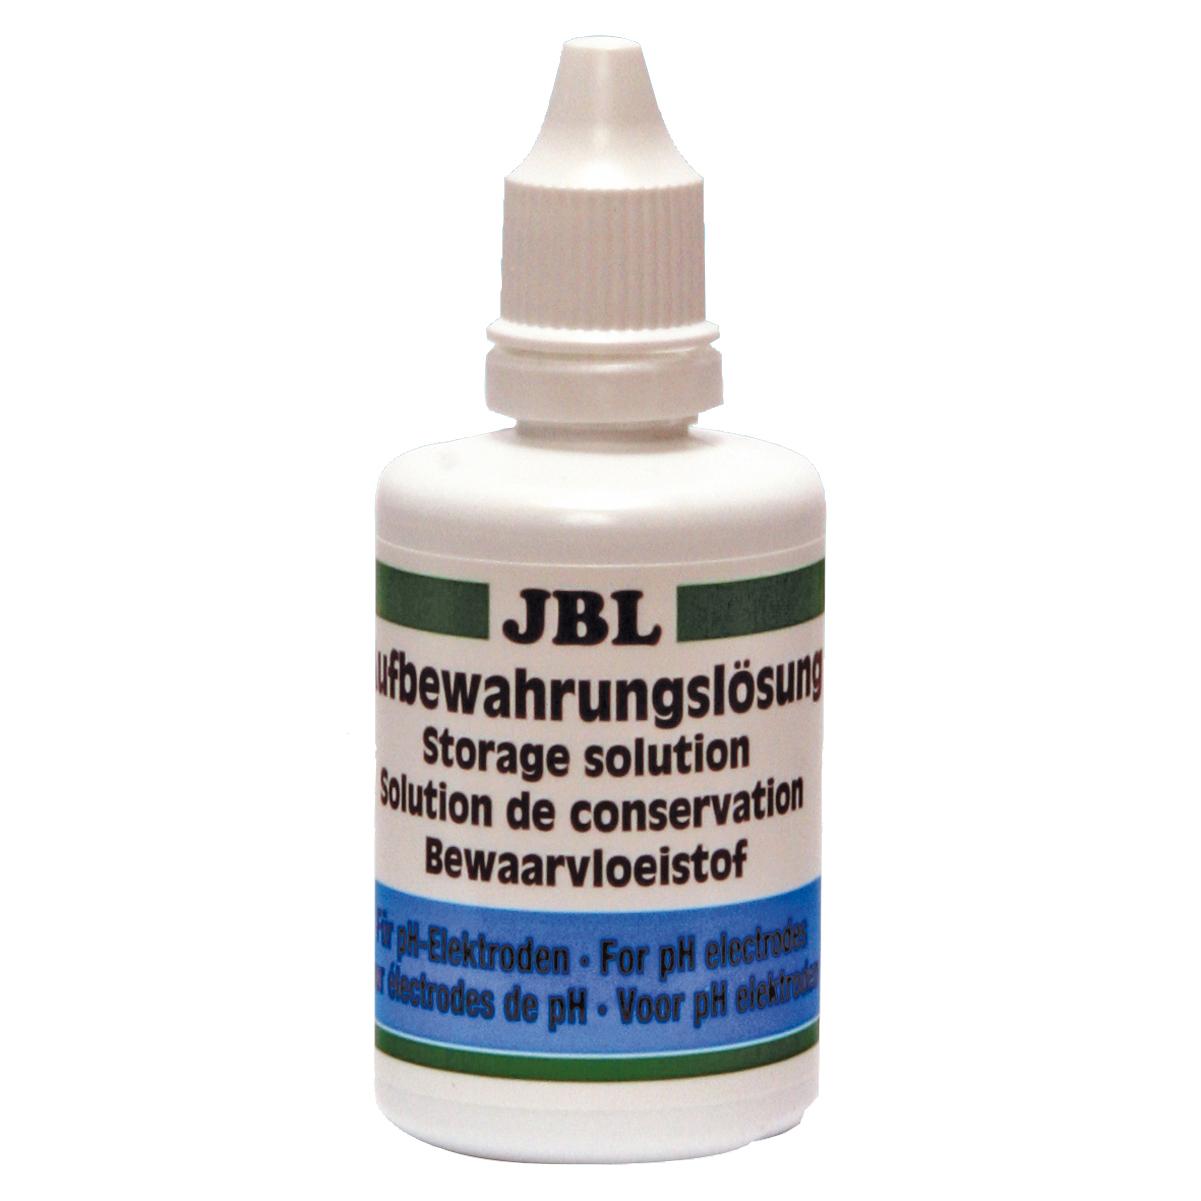 JBL Aufbewahrungslösung 50 ml 2590200